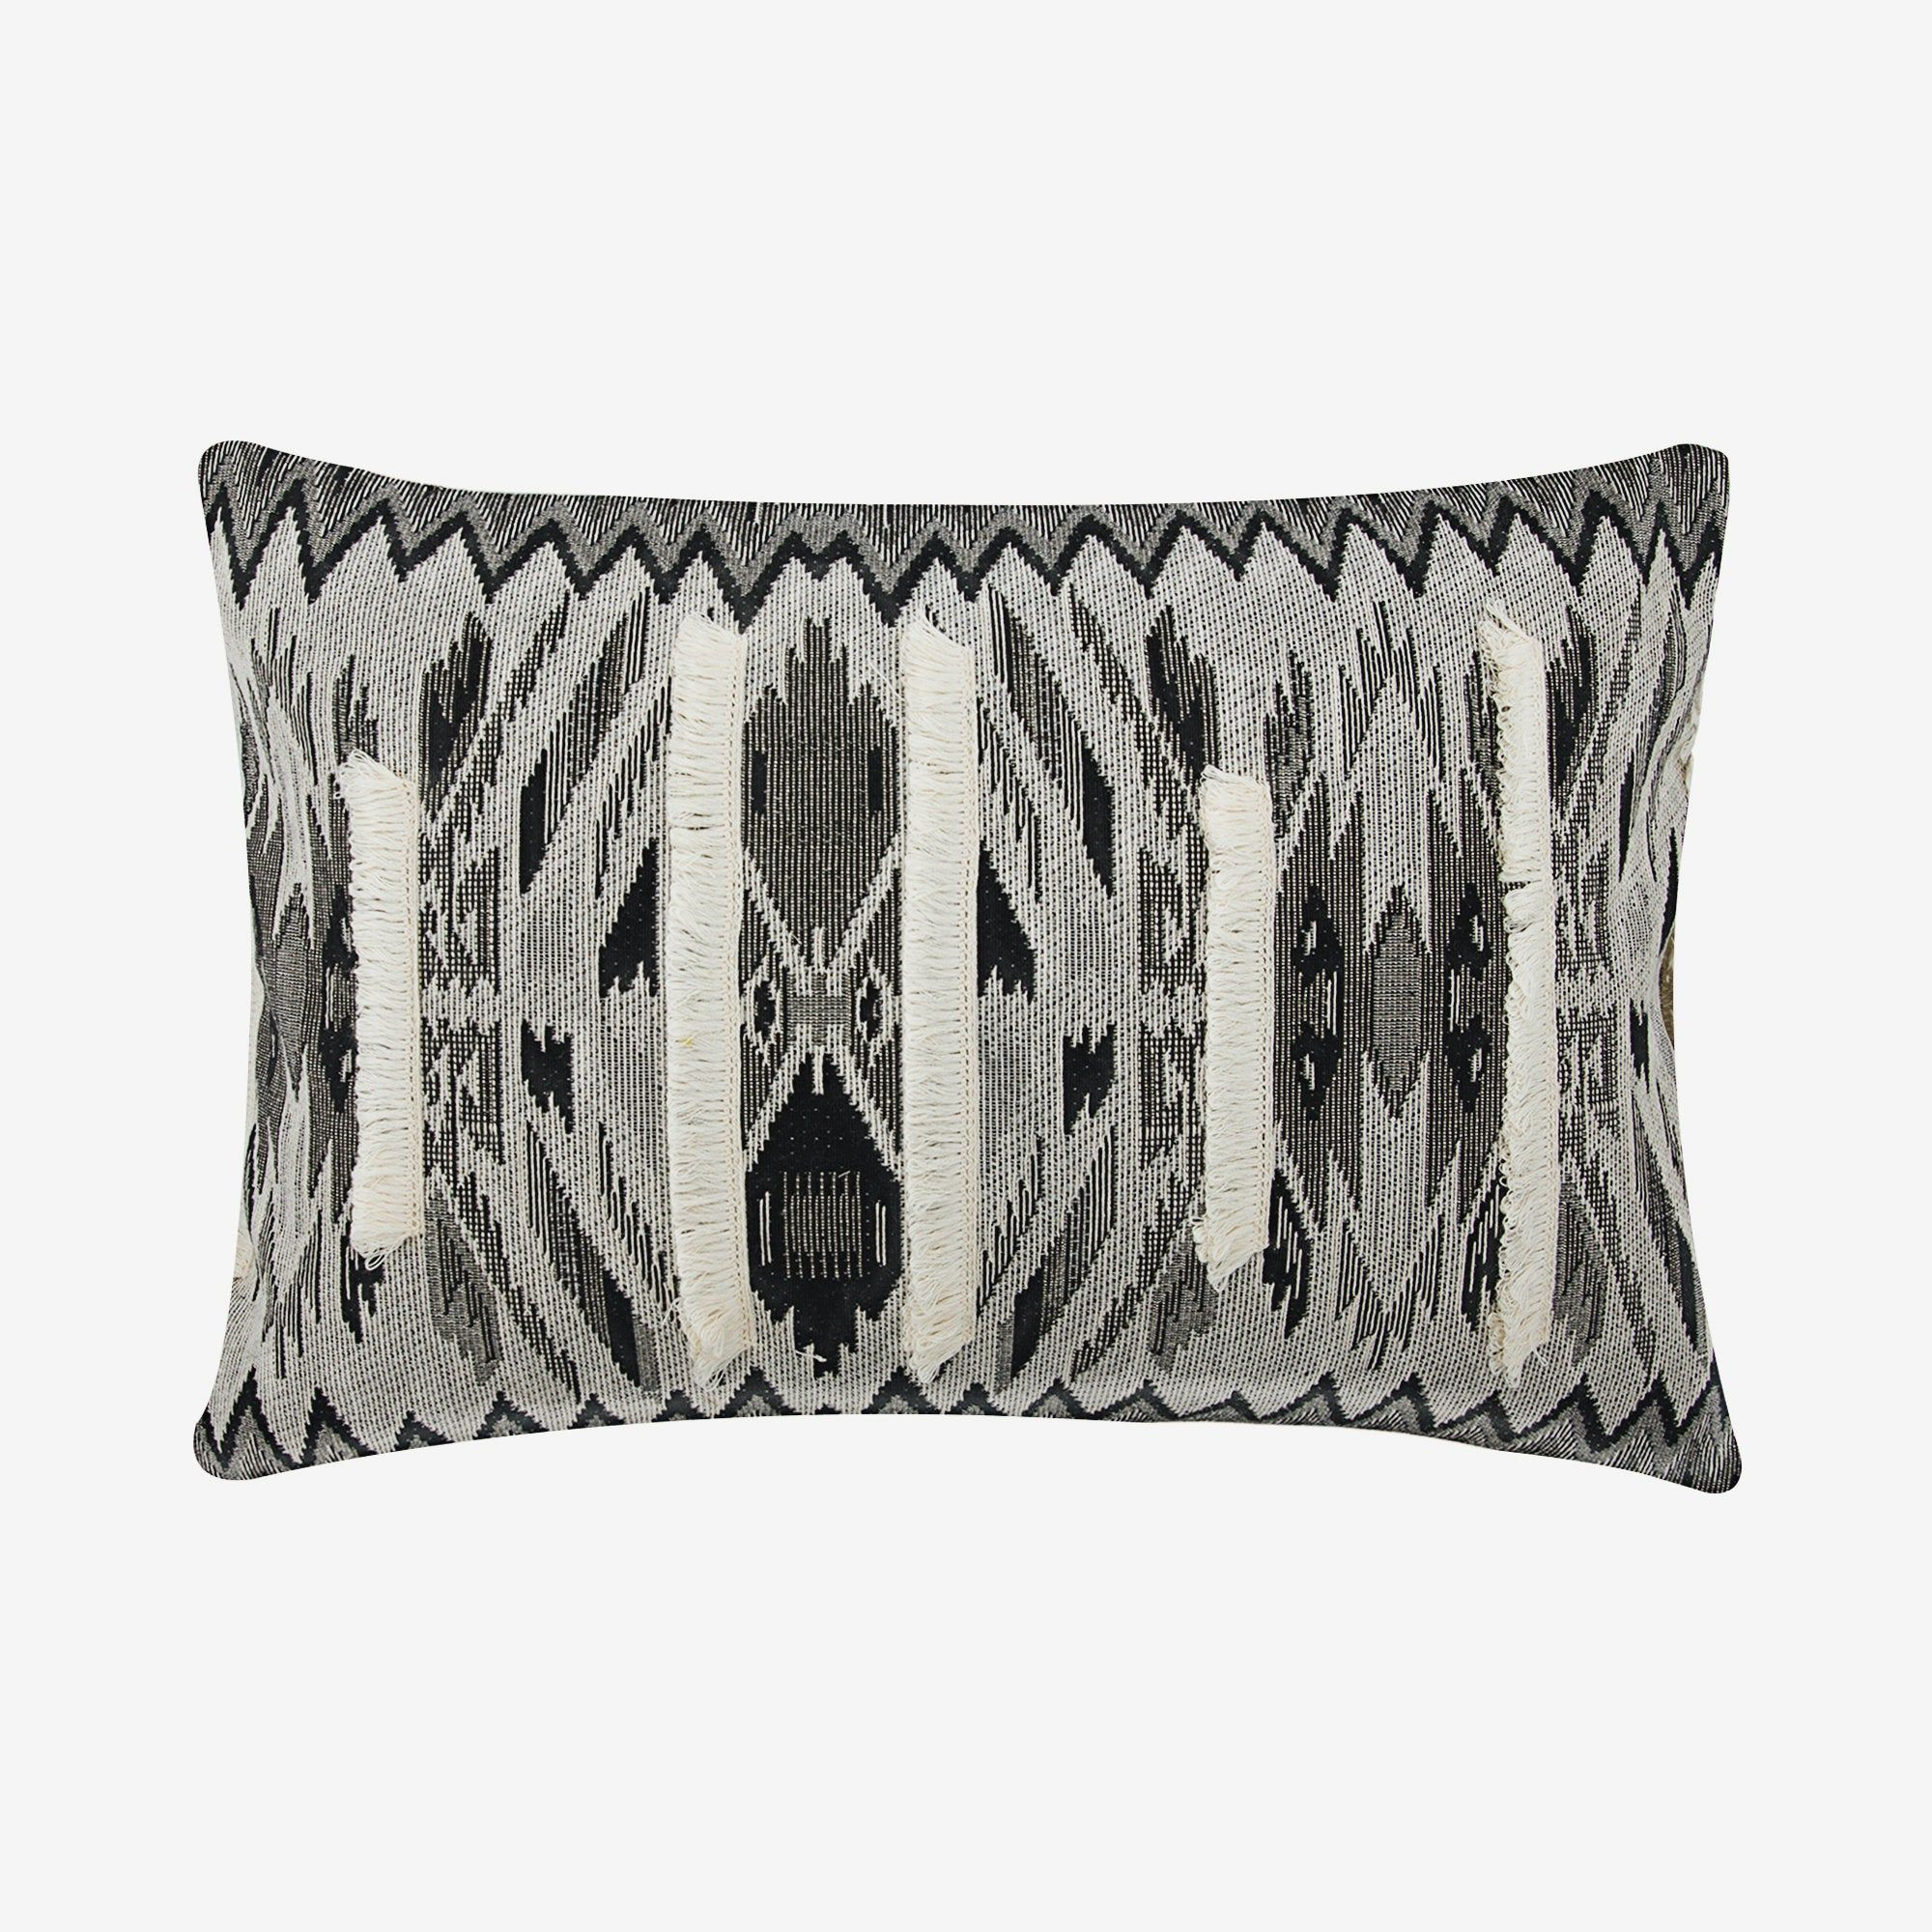 Decorative Oblong Lumbar Rectangle Throw Pillow Cover Couch Etsy In 2020 Throw Pillow Cover Couch Brown Decorative Pillows Embroidered Cushions